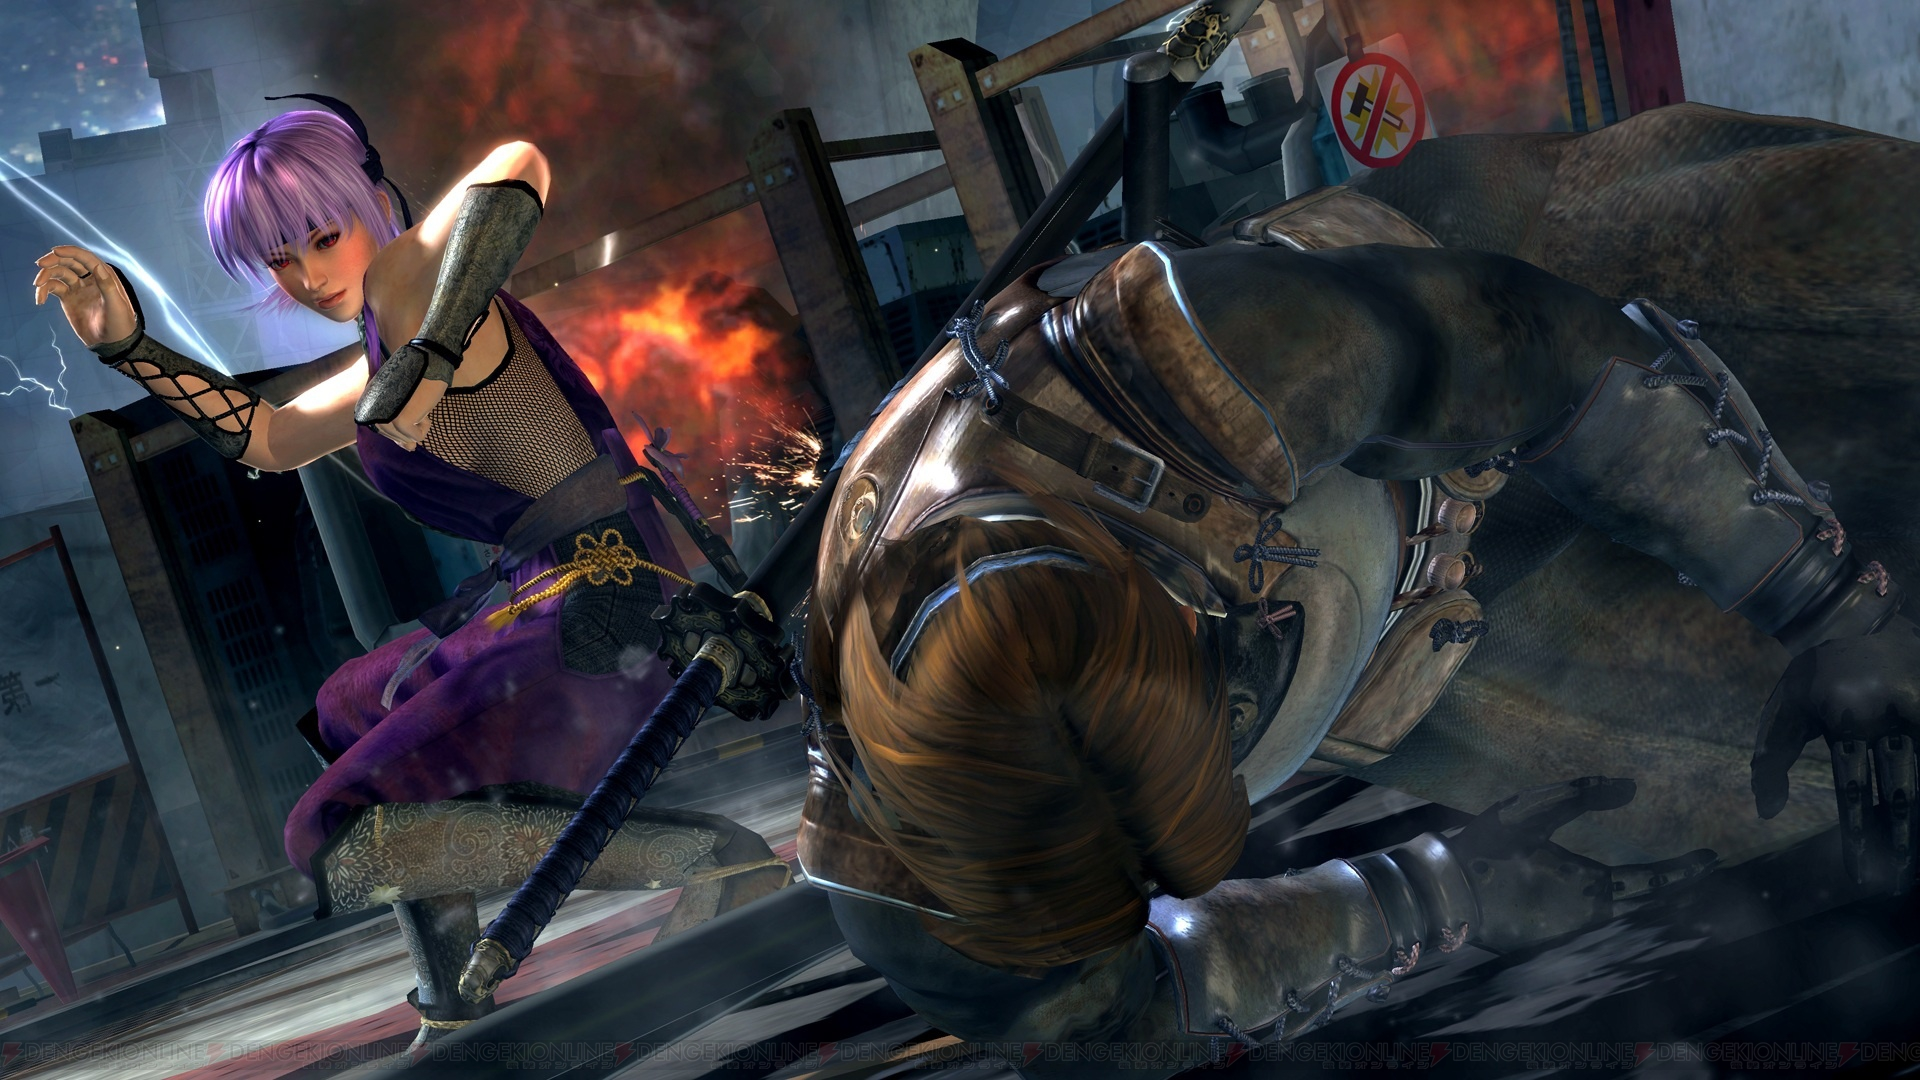 Doa ヒロイン3人の壁紙がもらえる Ninja Gaiden 3 初回特典の Dead Or Alive 5 体験版アンケートを実施 電撃オンライン